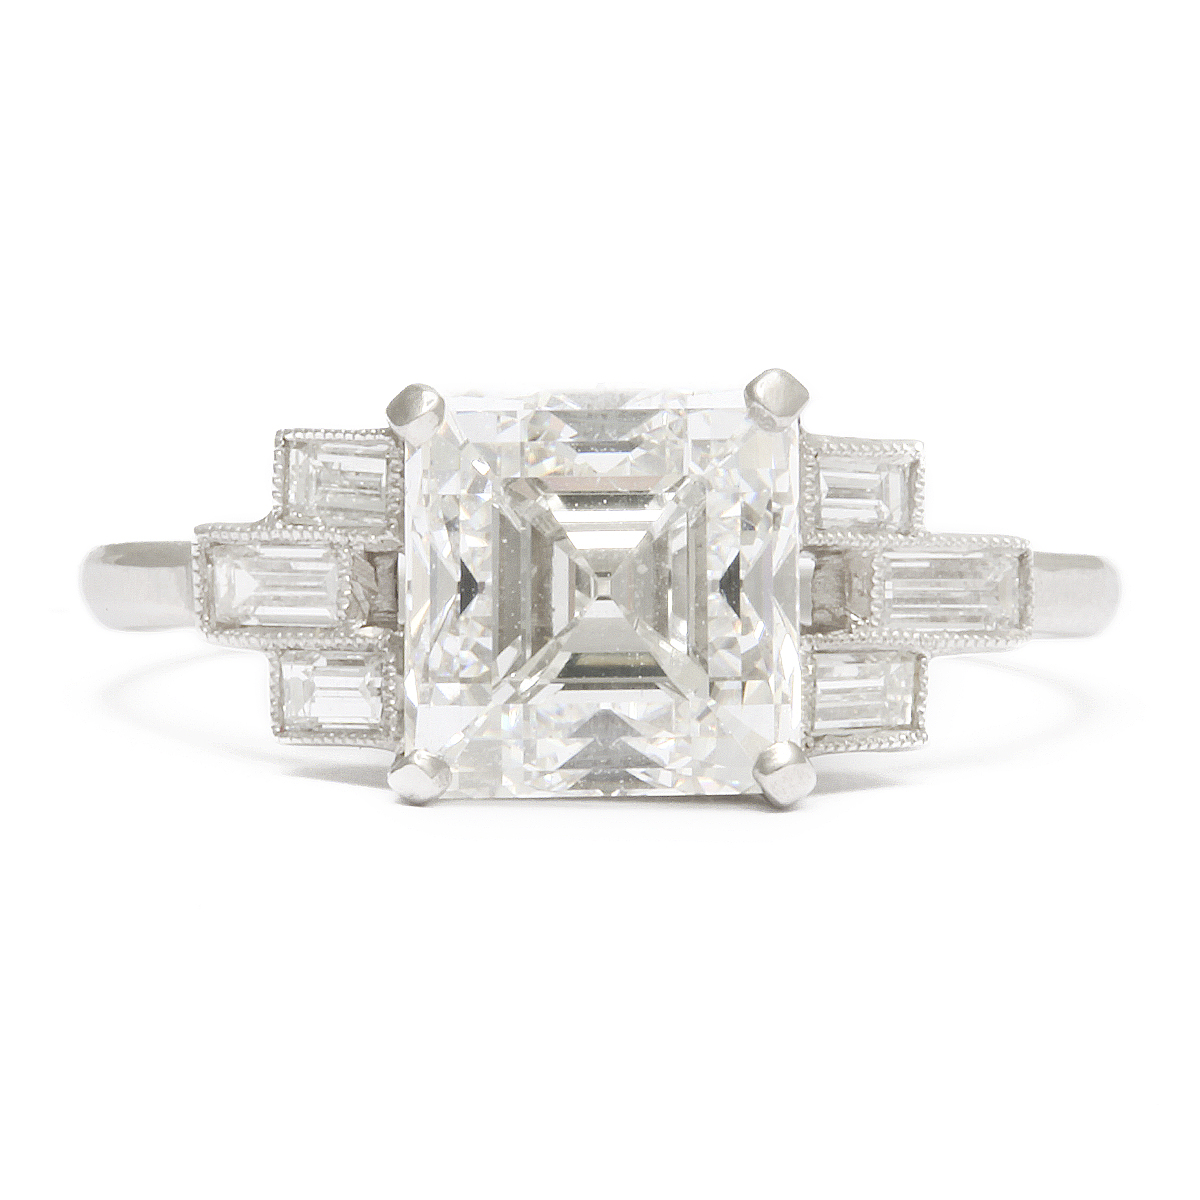 Art Deco Asscher Cut Diamond Engagement Ring A La Vieille Russie Faberge Antique Jewelry Russian Art Antiques Gold Snuffbox Dealers Alvr Ny